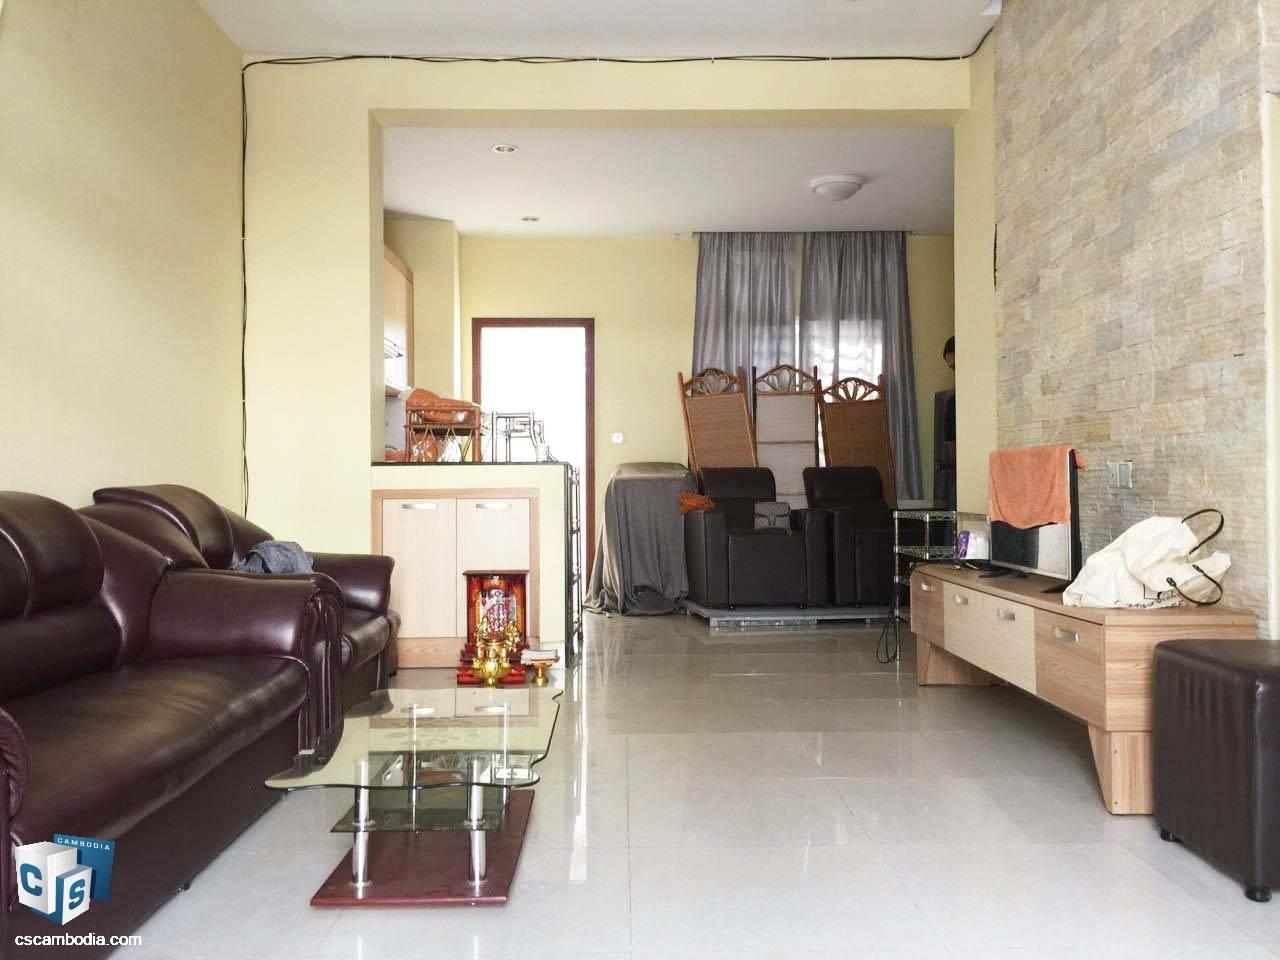 3 Bedroom House – For Rent- Kruos Village – Svay Dangkom Commune – Siem Reap